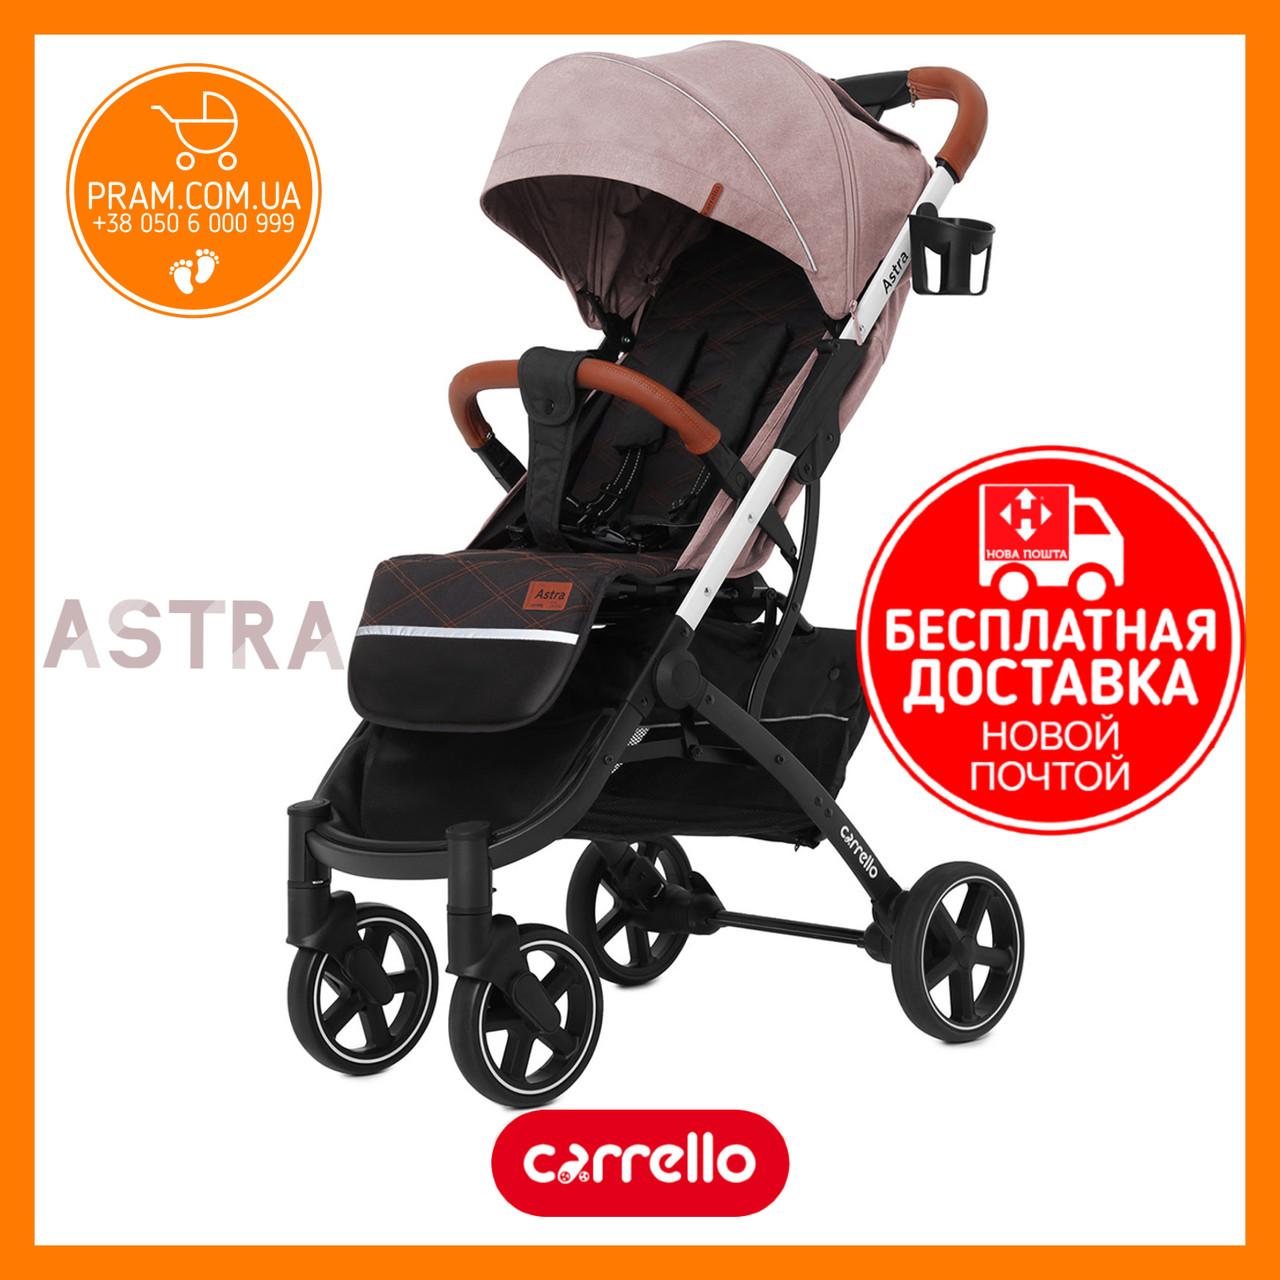 CARRELLO ASTRA CRL-5505 прогулочная коляска Apricot Pink